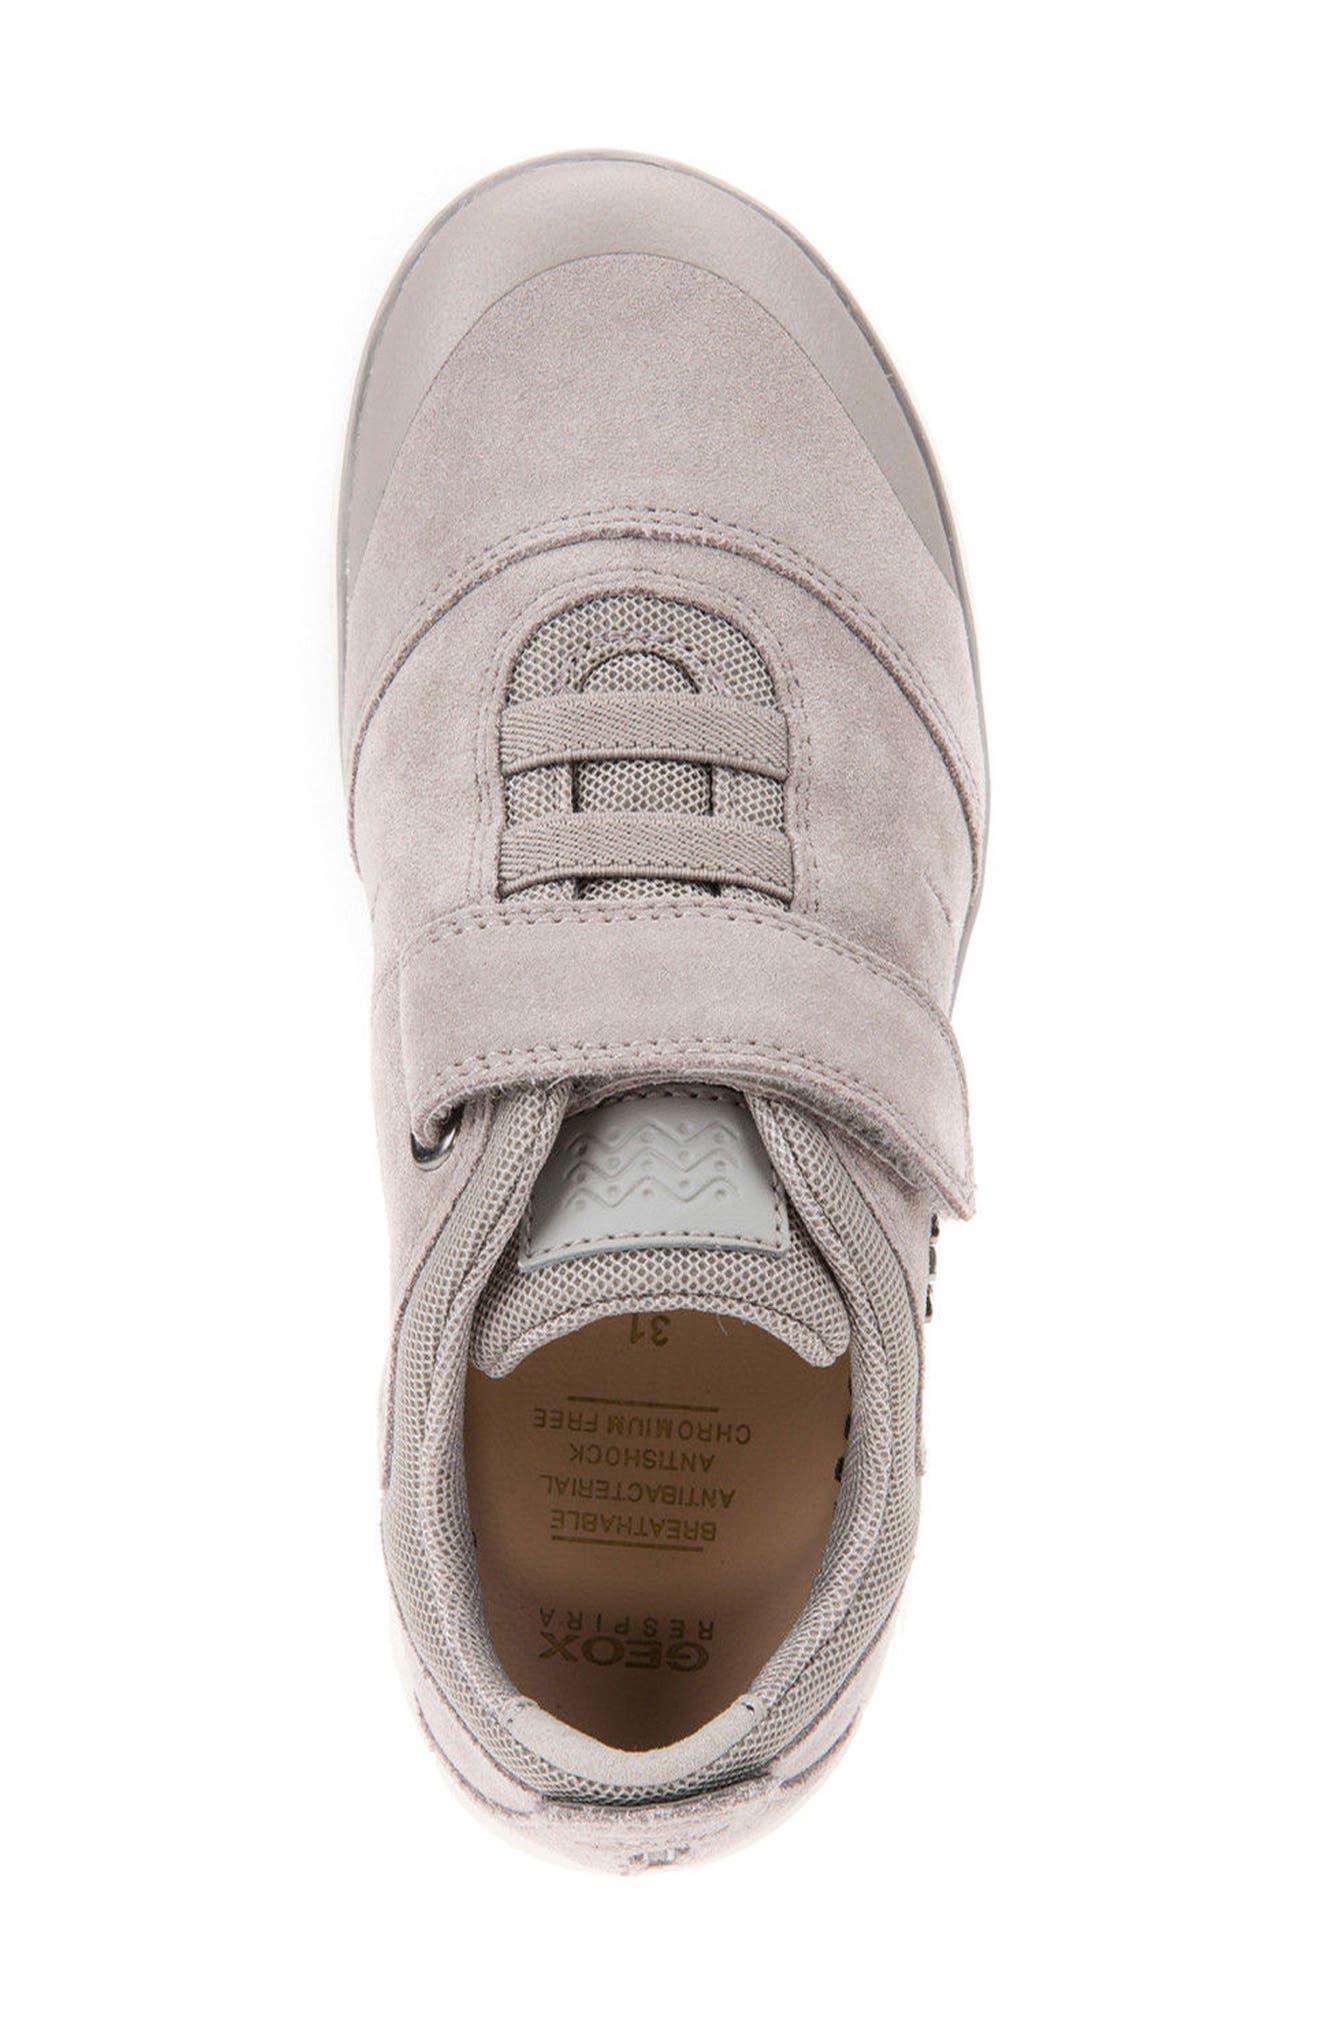 Nebula Low Top Sneaker,                             Alternate thumbnail 5, color,                             Grey